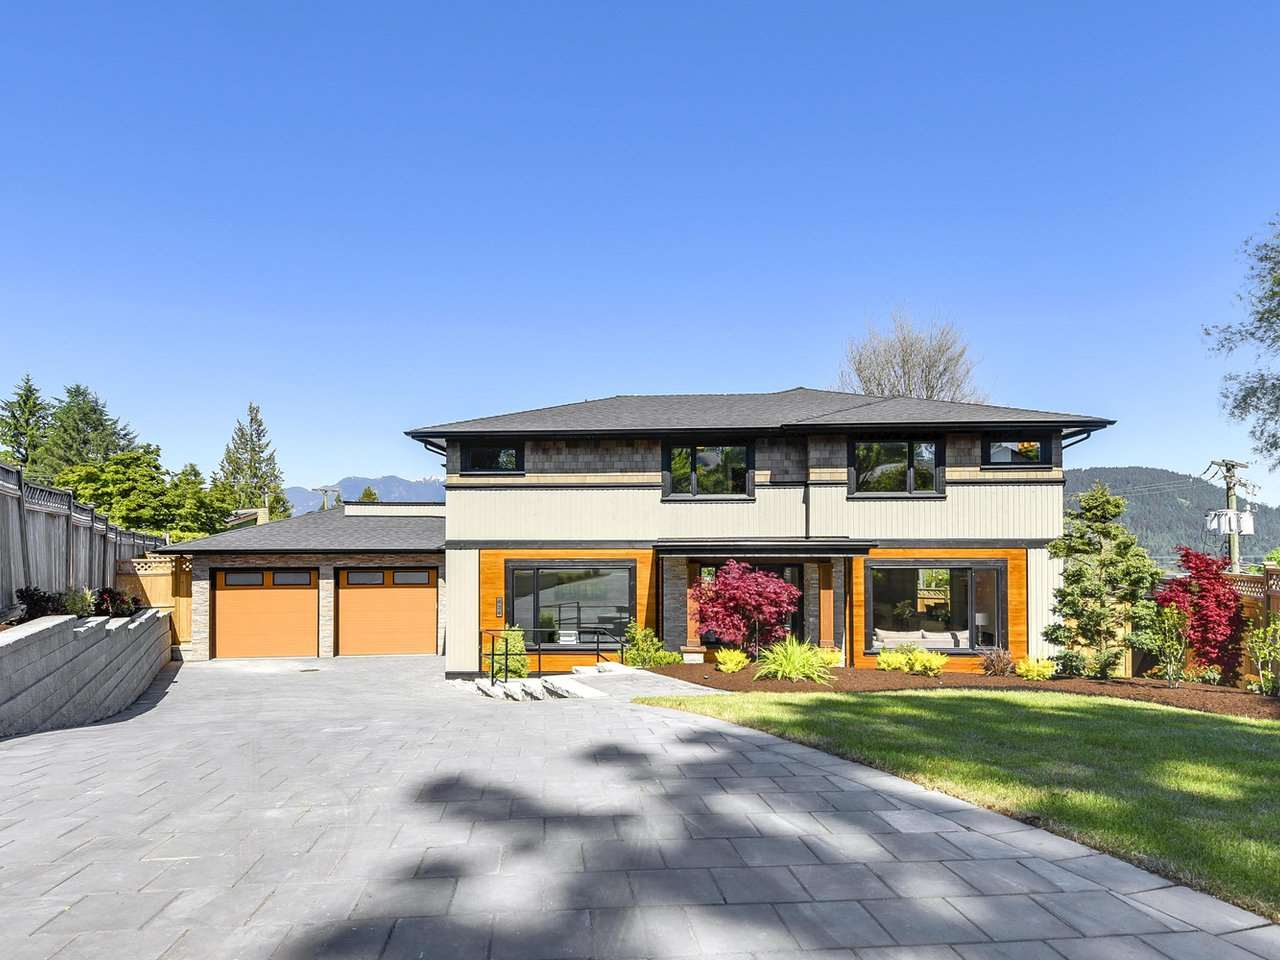 434 FELTON PLACE, North Vancouver, BC V7G 1T7